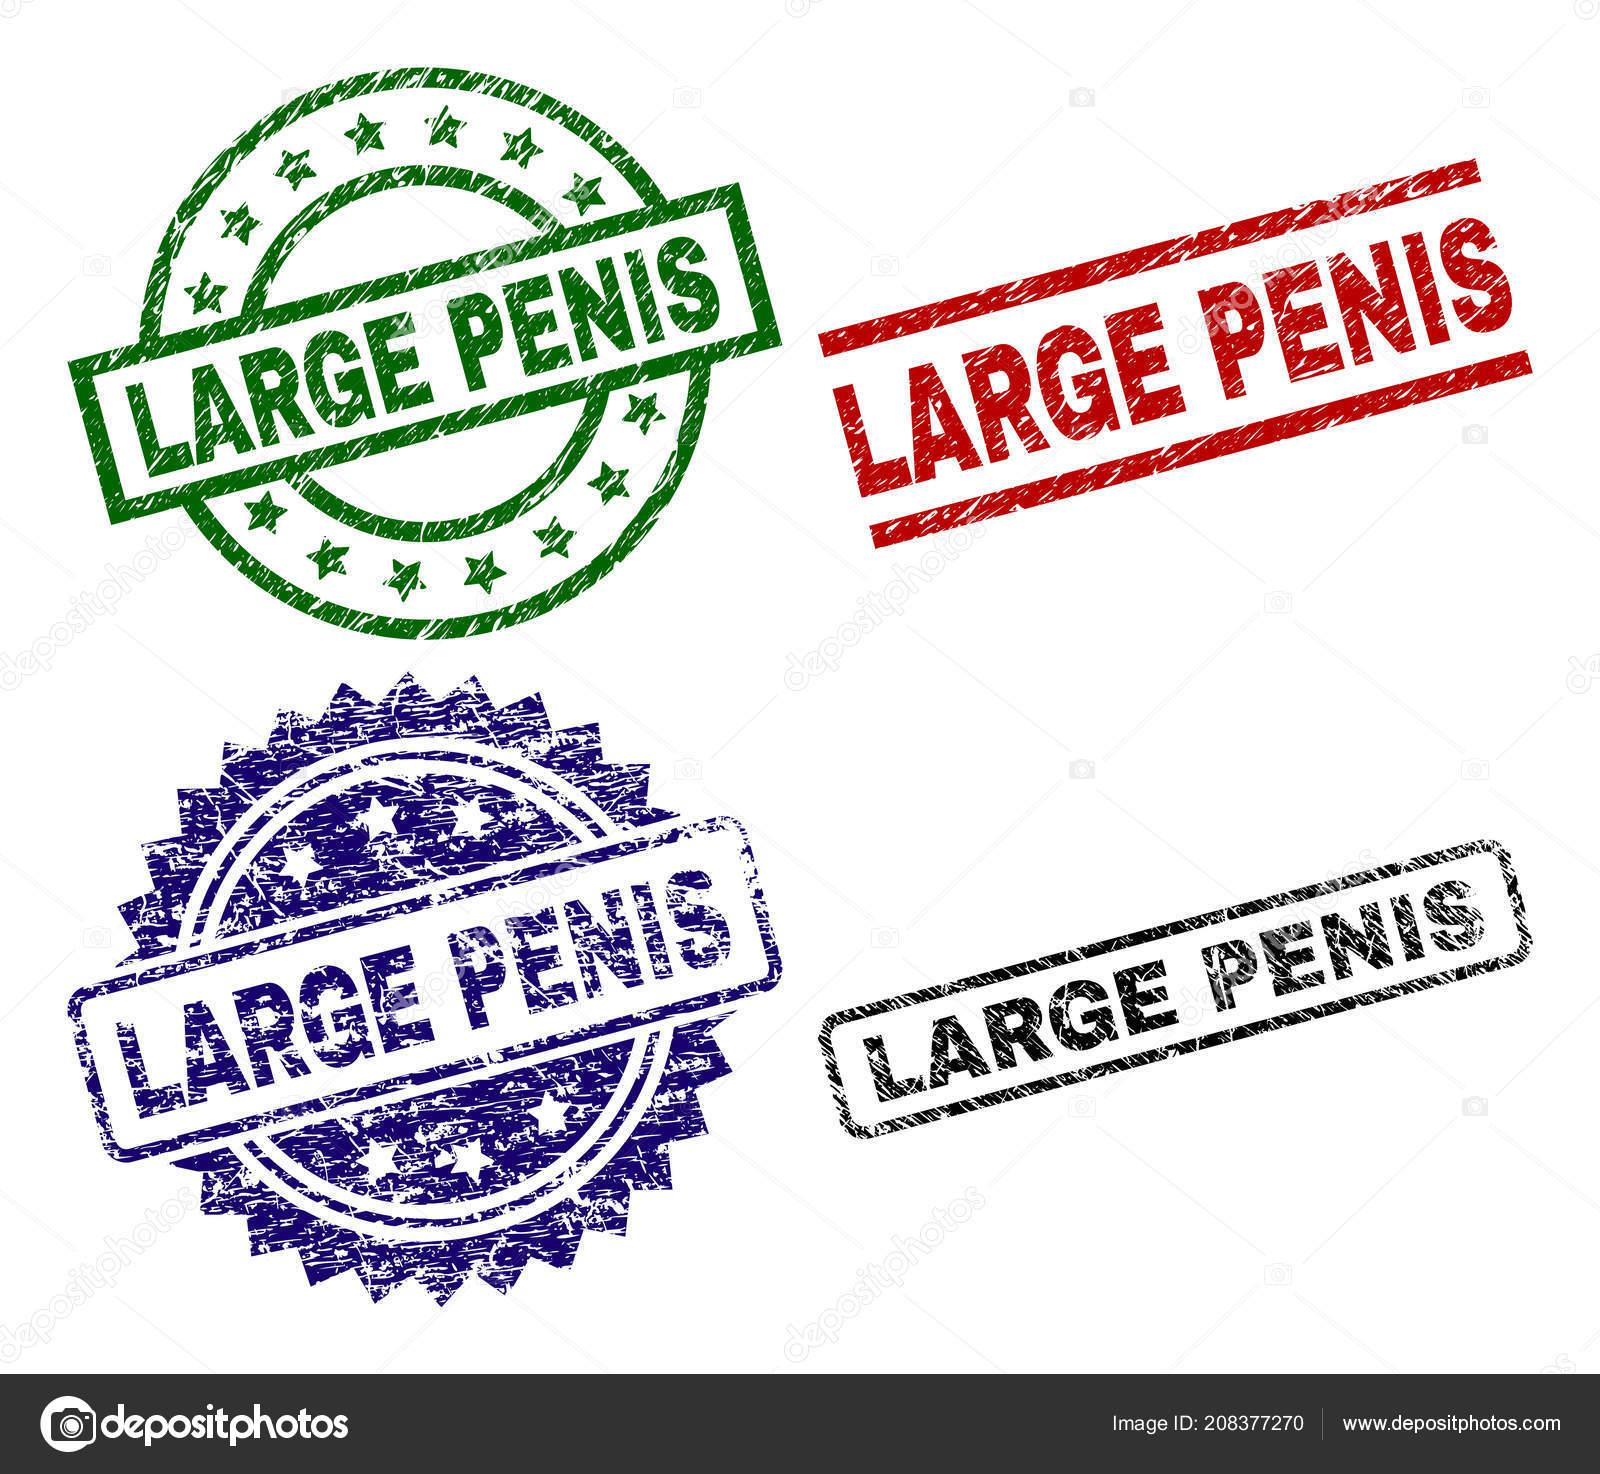 zrzka lesbické porno fotky